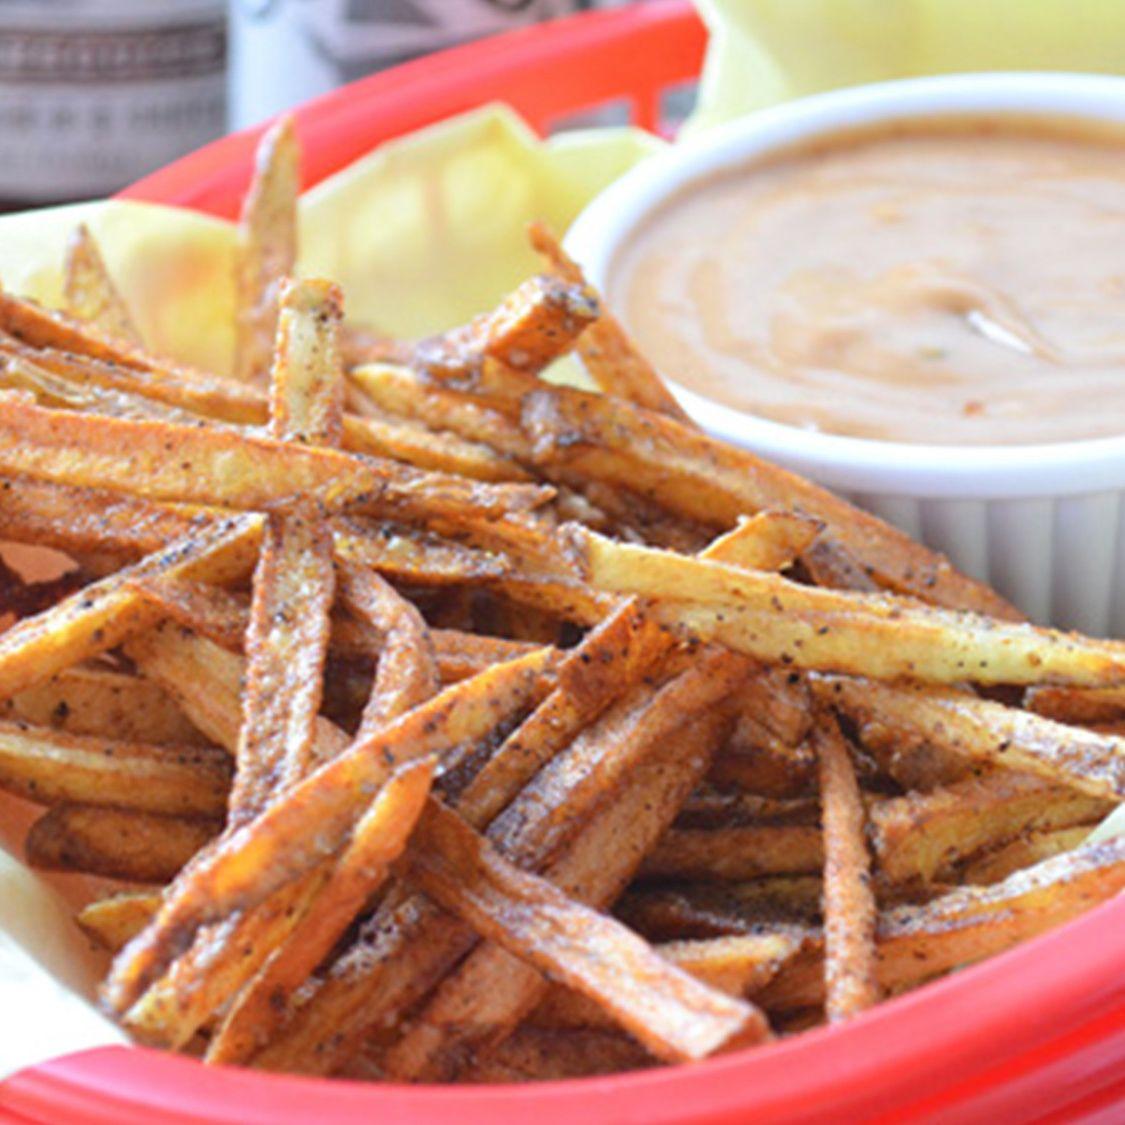 seasoned_shoestring_fries_with_creamy_mesquite_fry_sauce.jpg